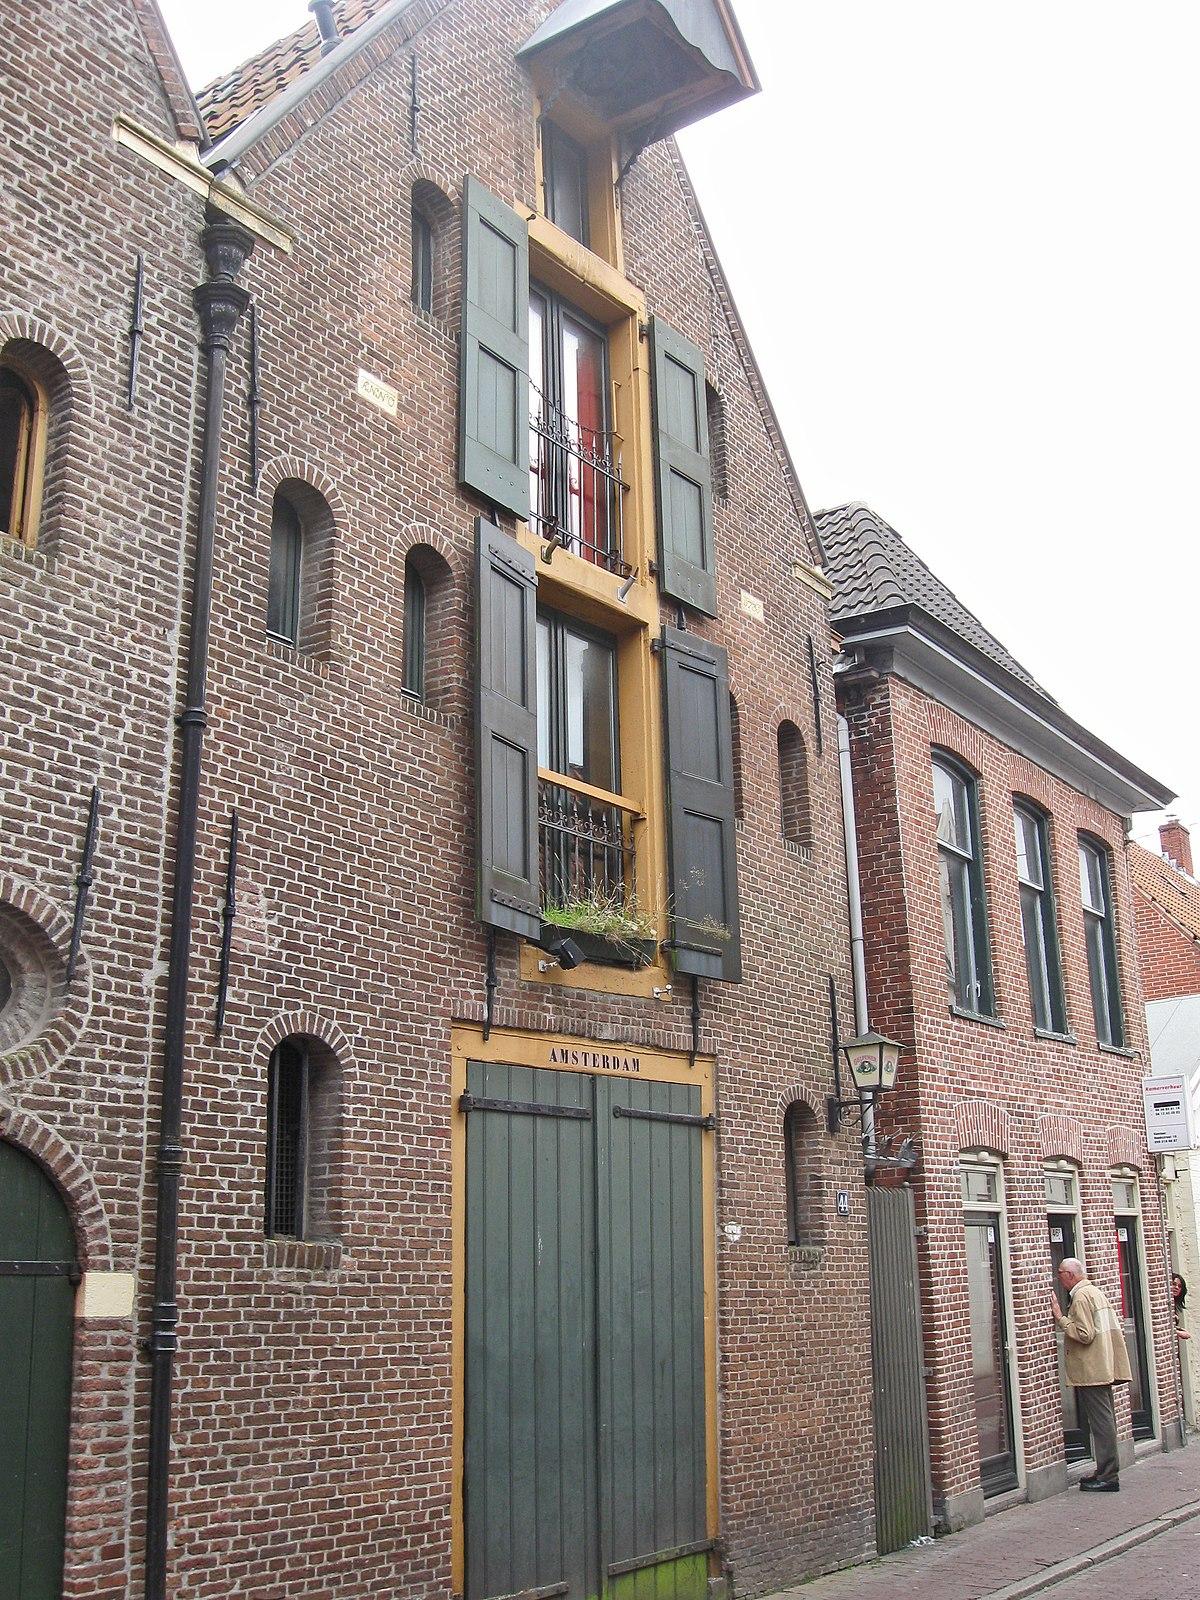 pakhuis amsterdam groningen wikipedia